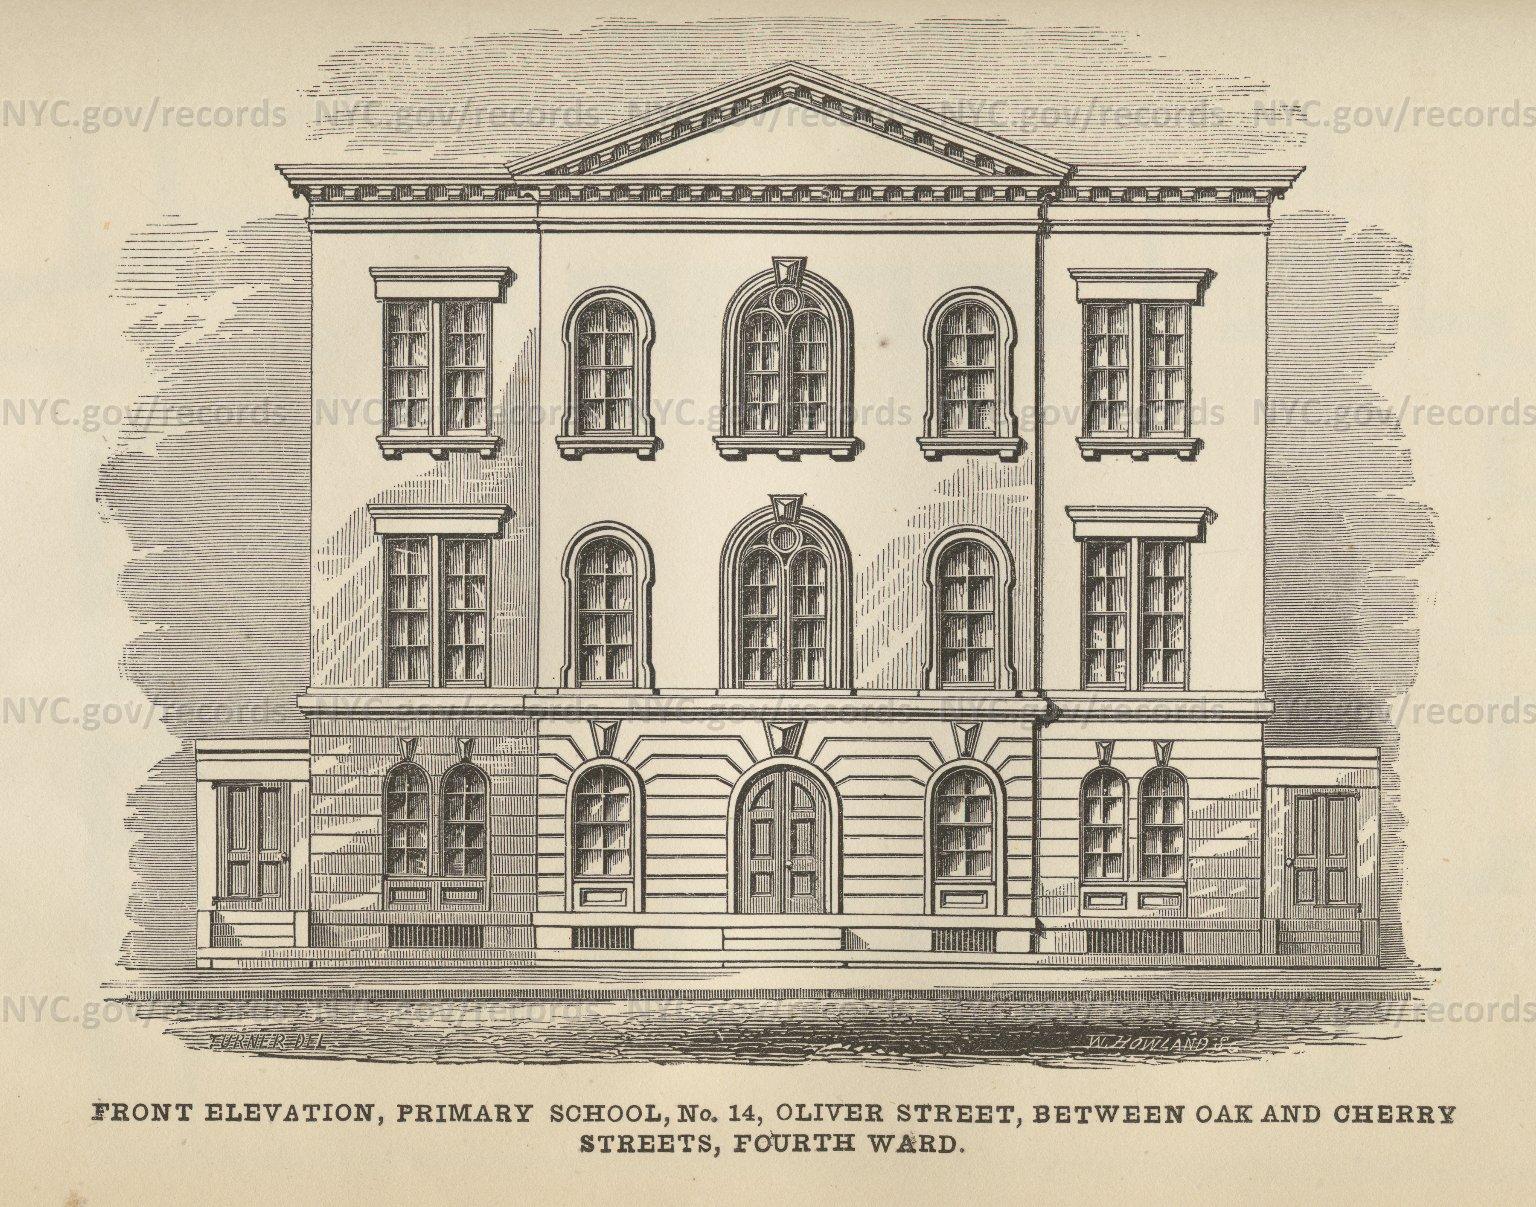 Primary School 14: front elevation